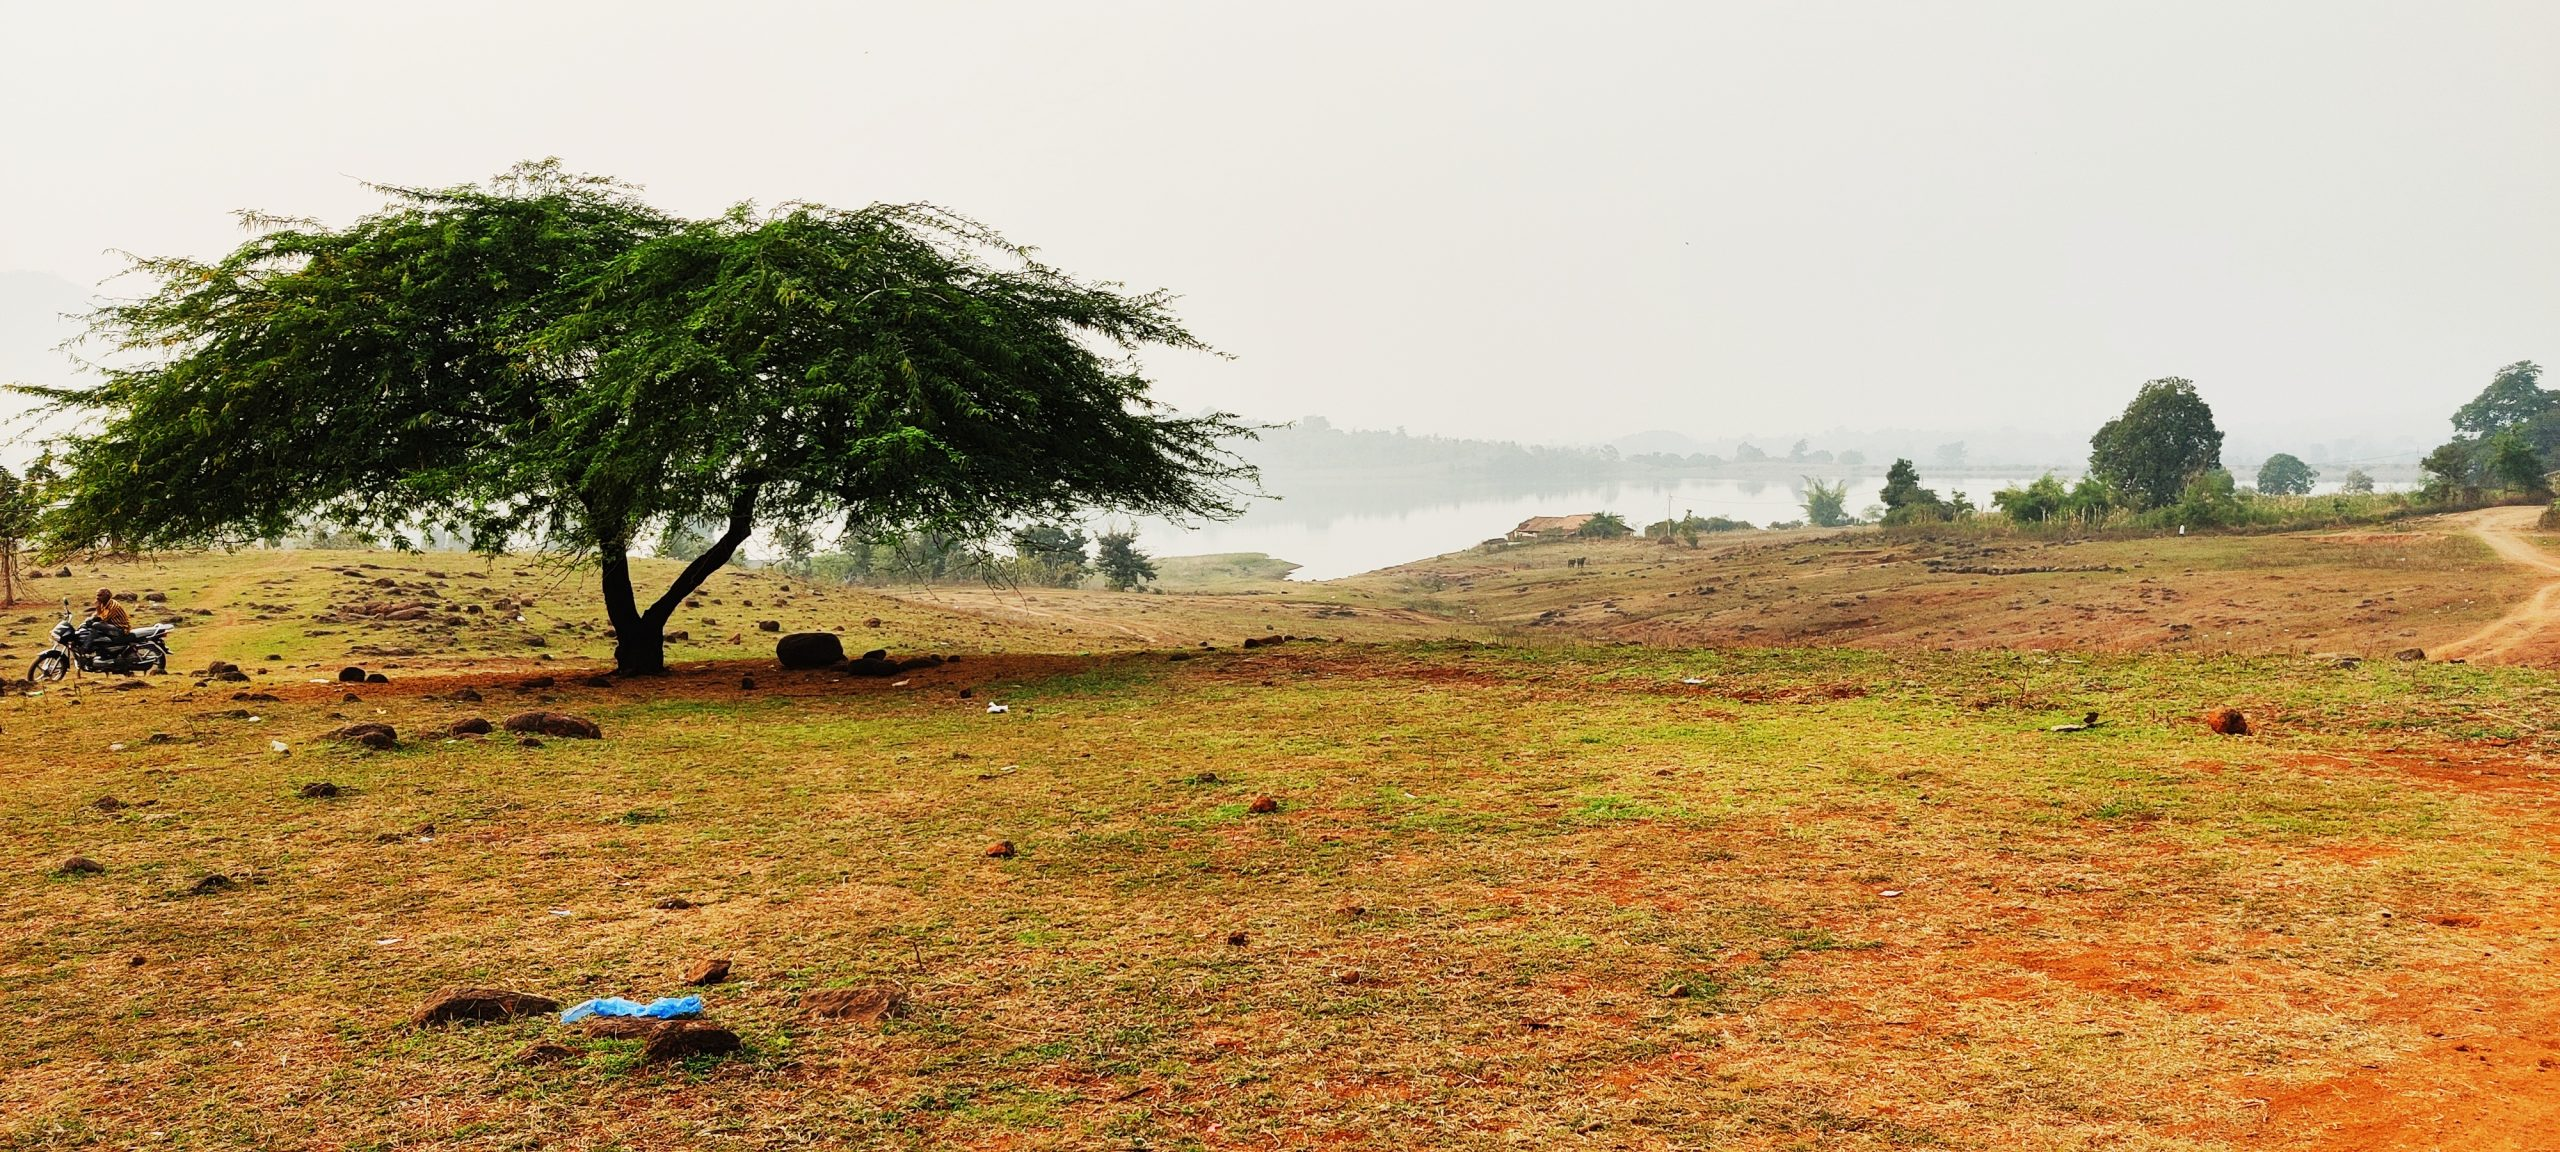 tree in a grassland